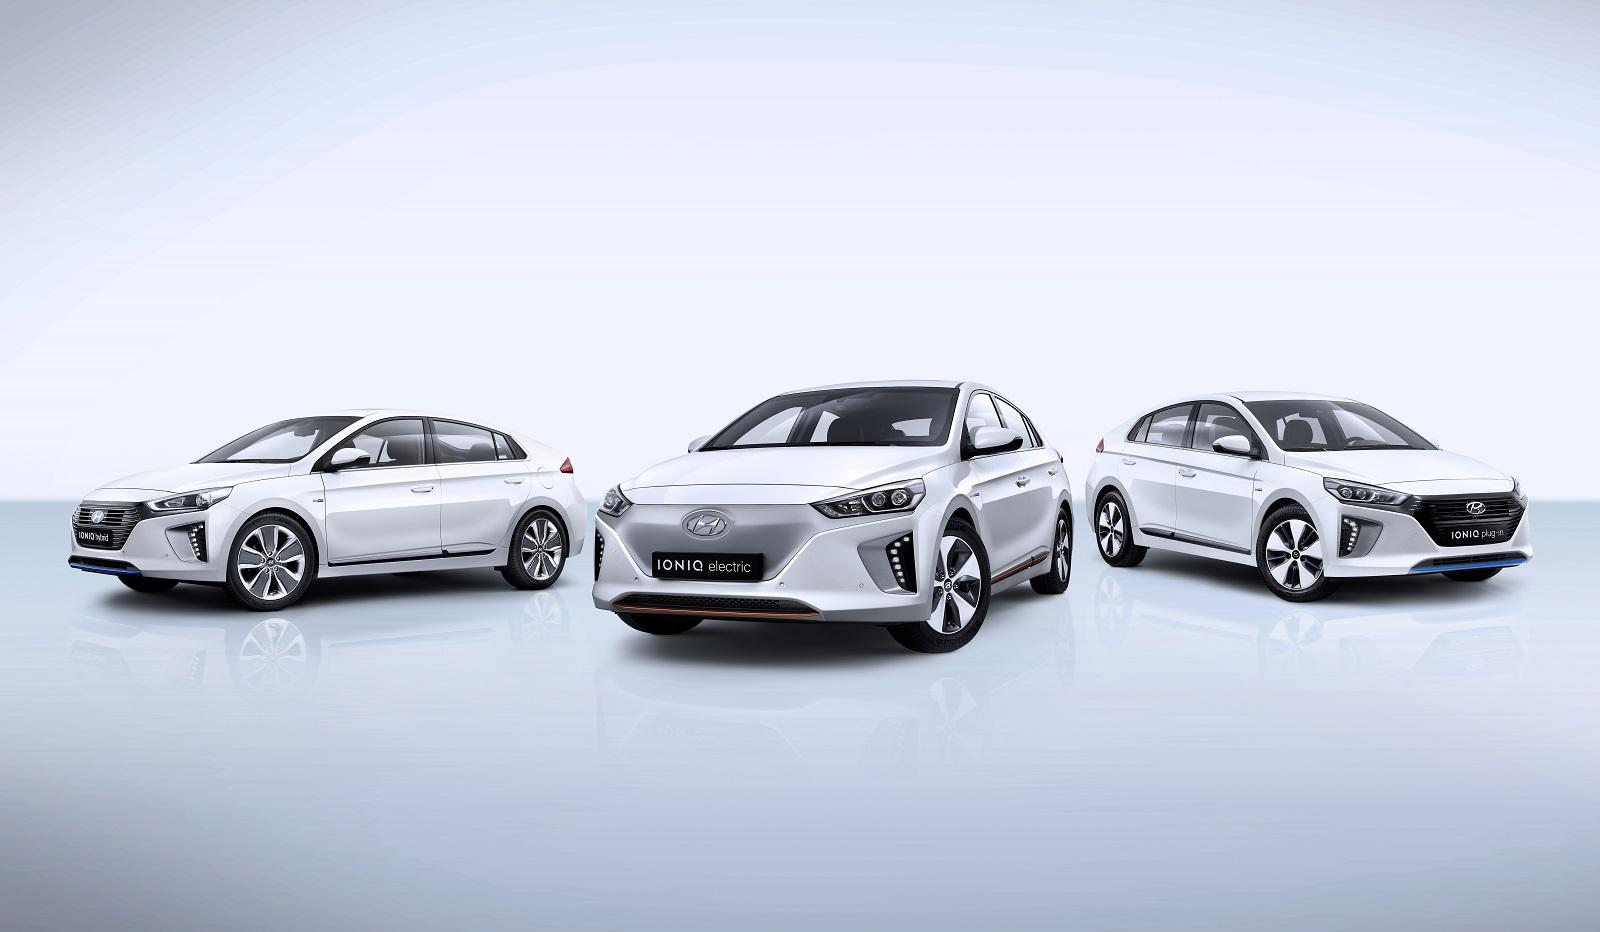 Hybrid Car Battery Replacement 2017 Hyundai Ioniq Lineup Specs, Details Emerge For Geneva Motor Show ...